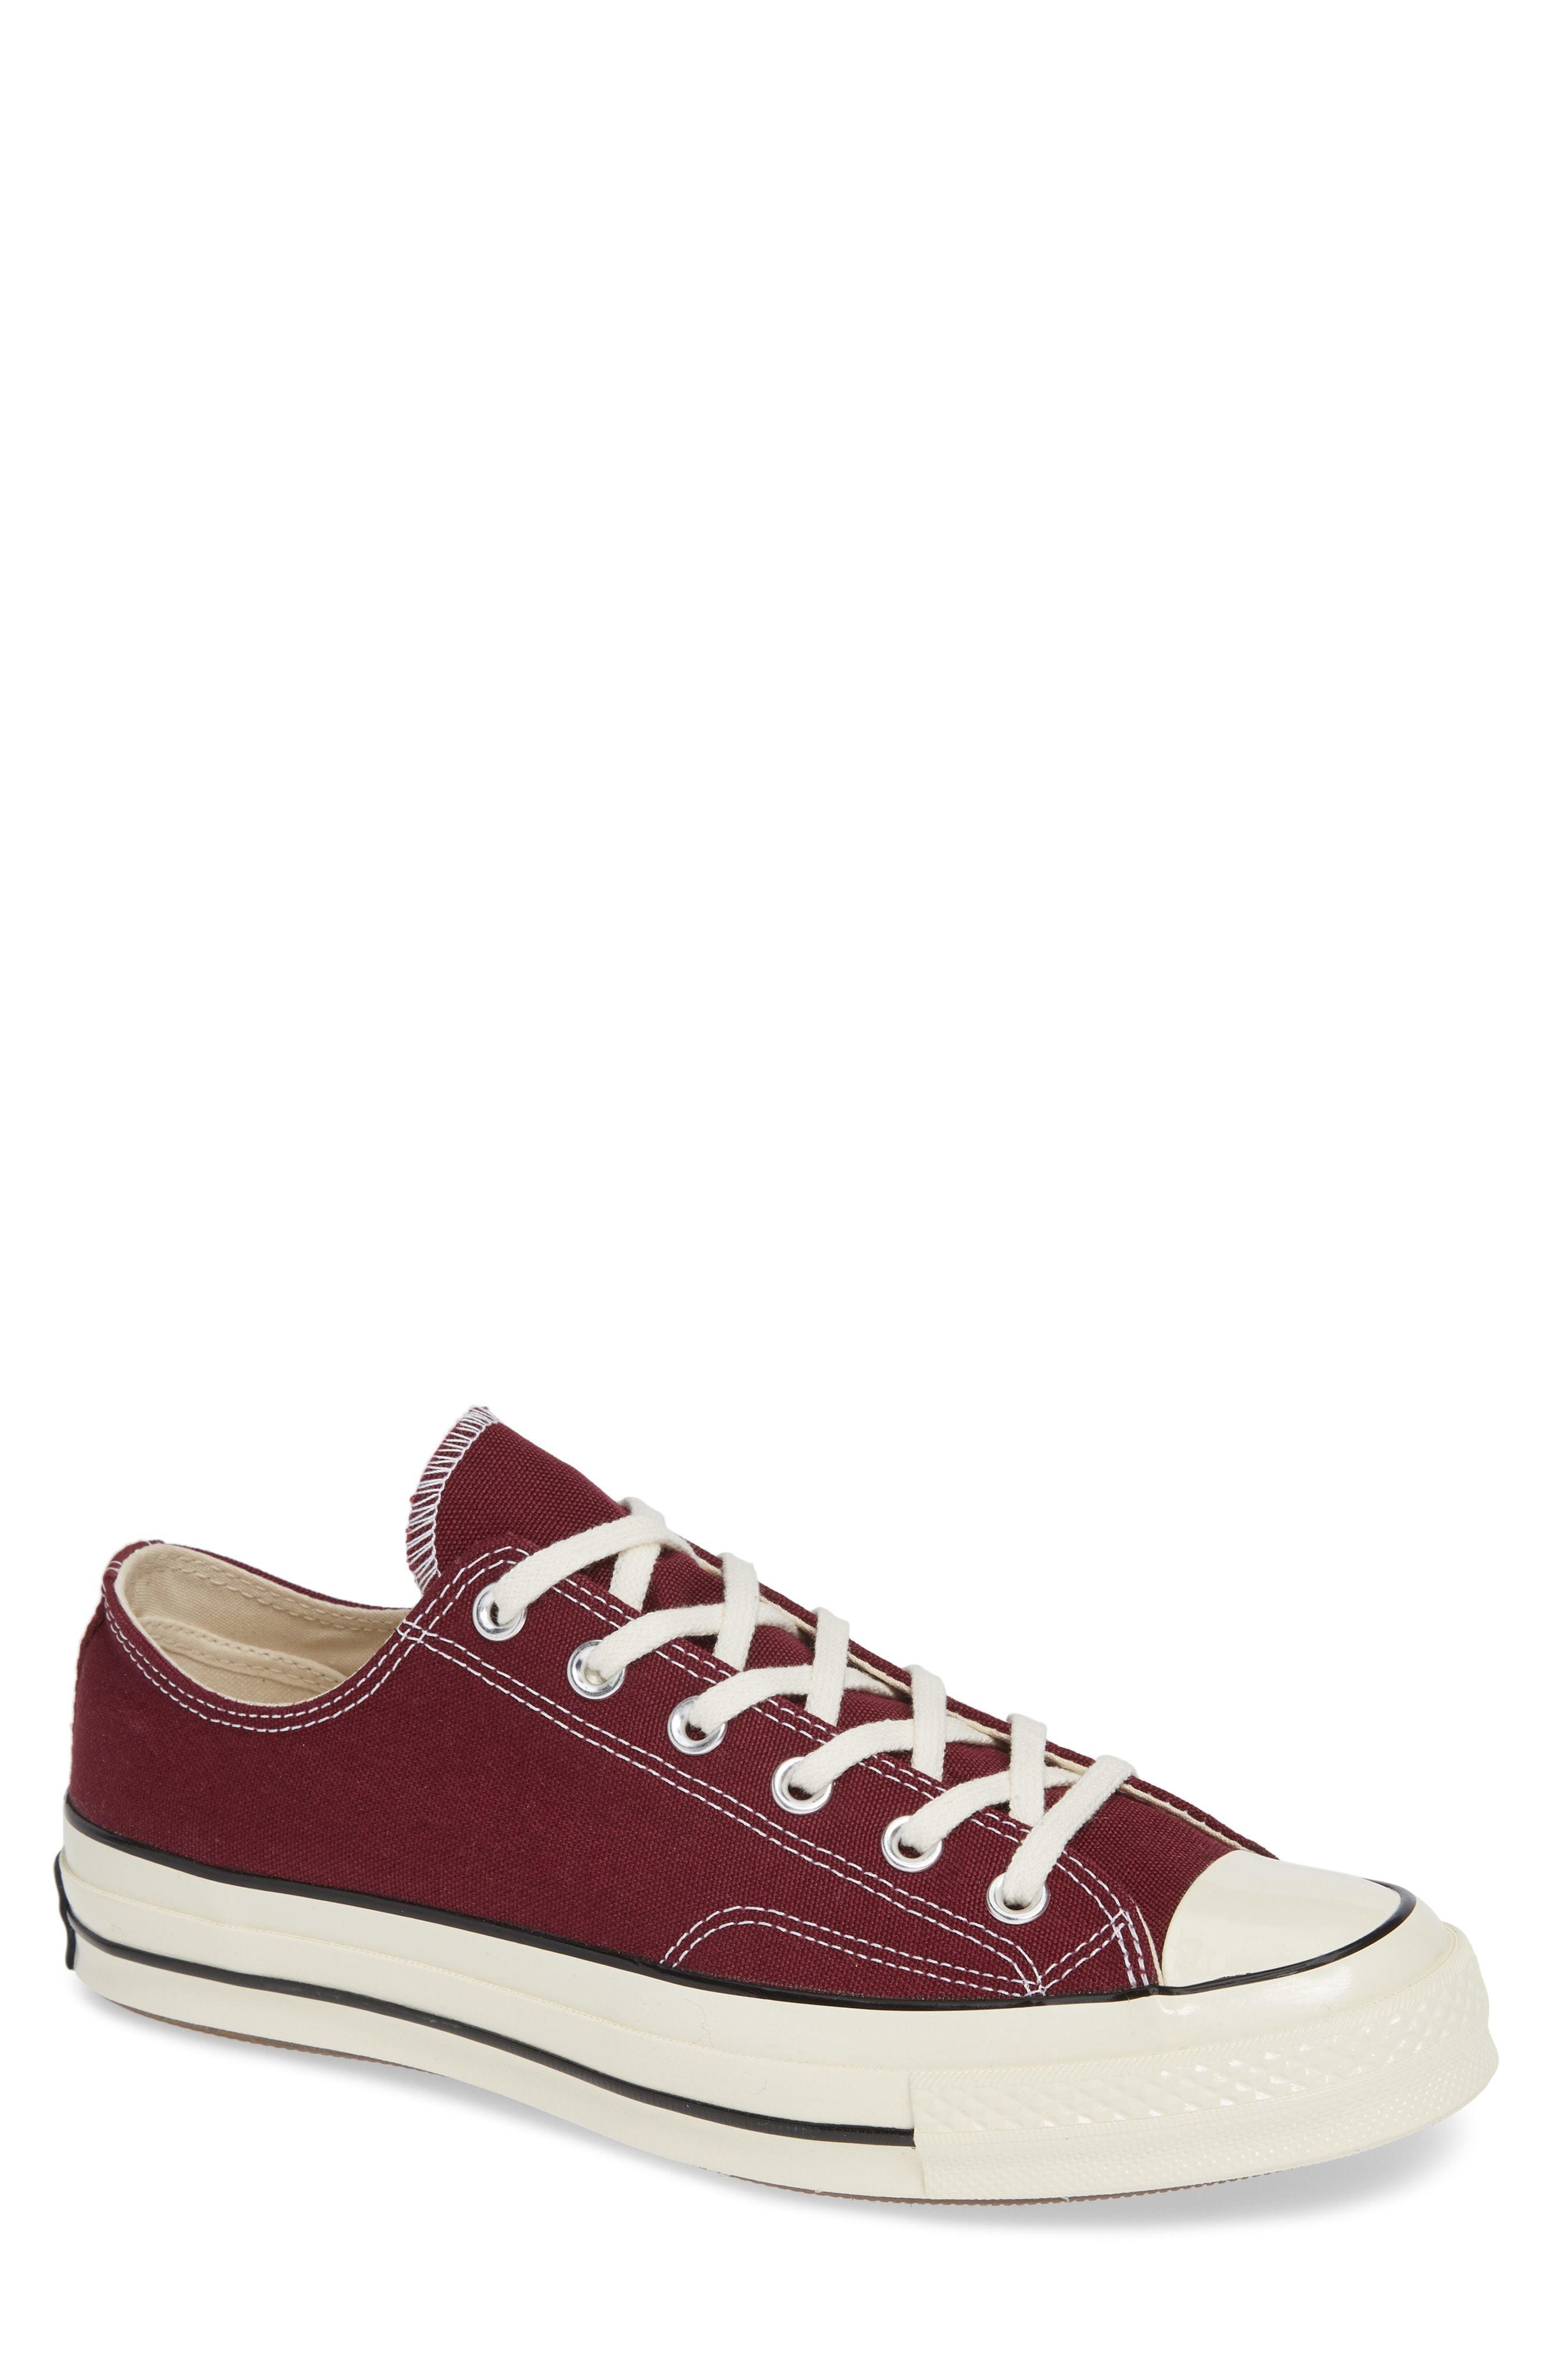 9800f579d981 ... Burgundy Low Top Sneakers Converse Chuck Taylor 70 Low Top Sneaker